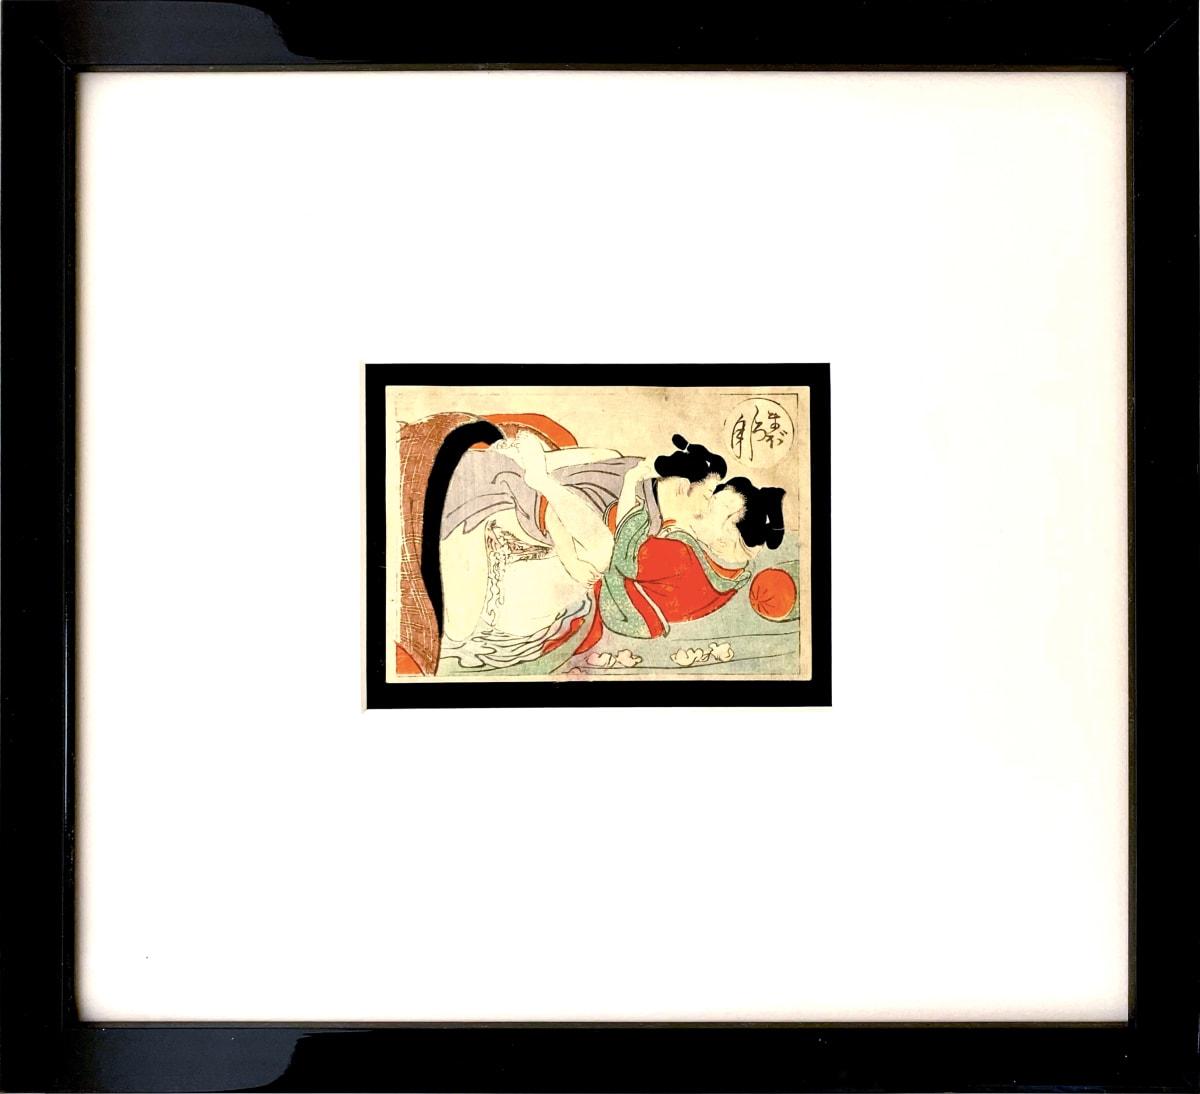 3952 - Shunga -- Spring Pictures  #10 by Meiji Era 1868-1912